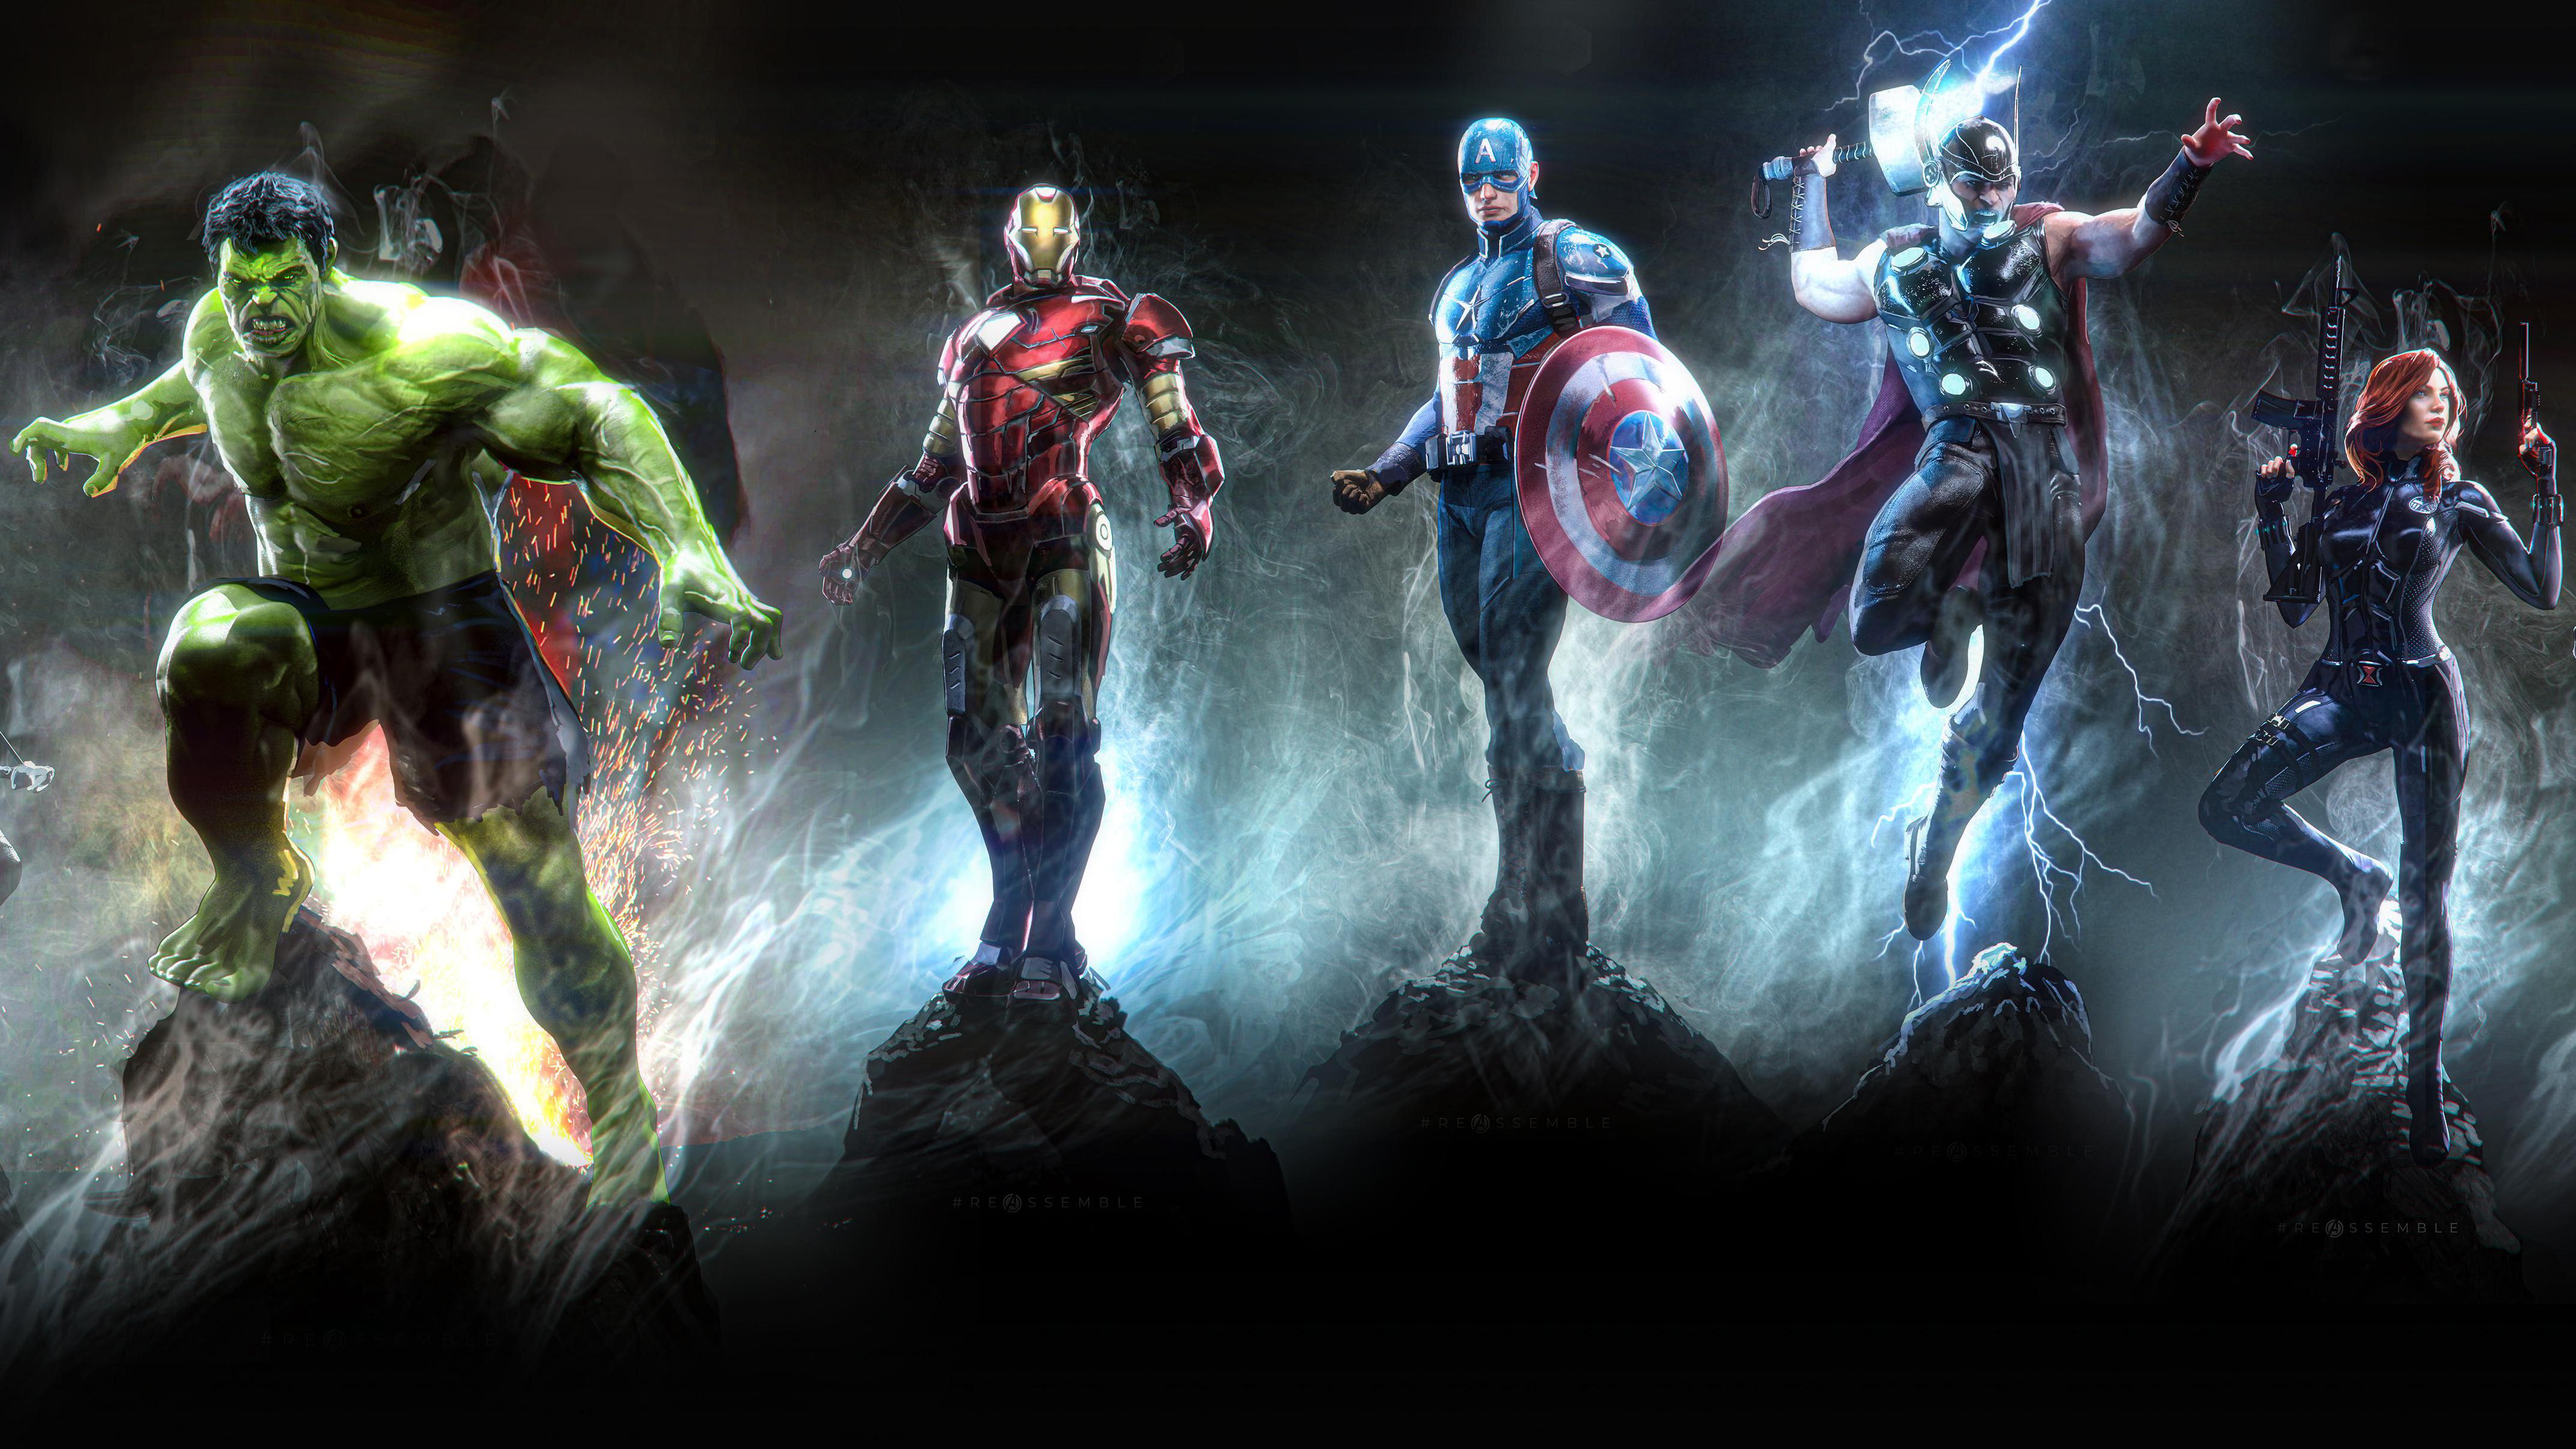 1280x720 Avengers 4k Art 720P HD 4k Wallpapers, Images ...